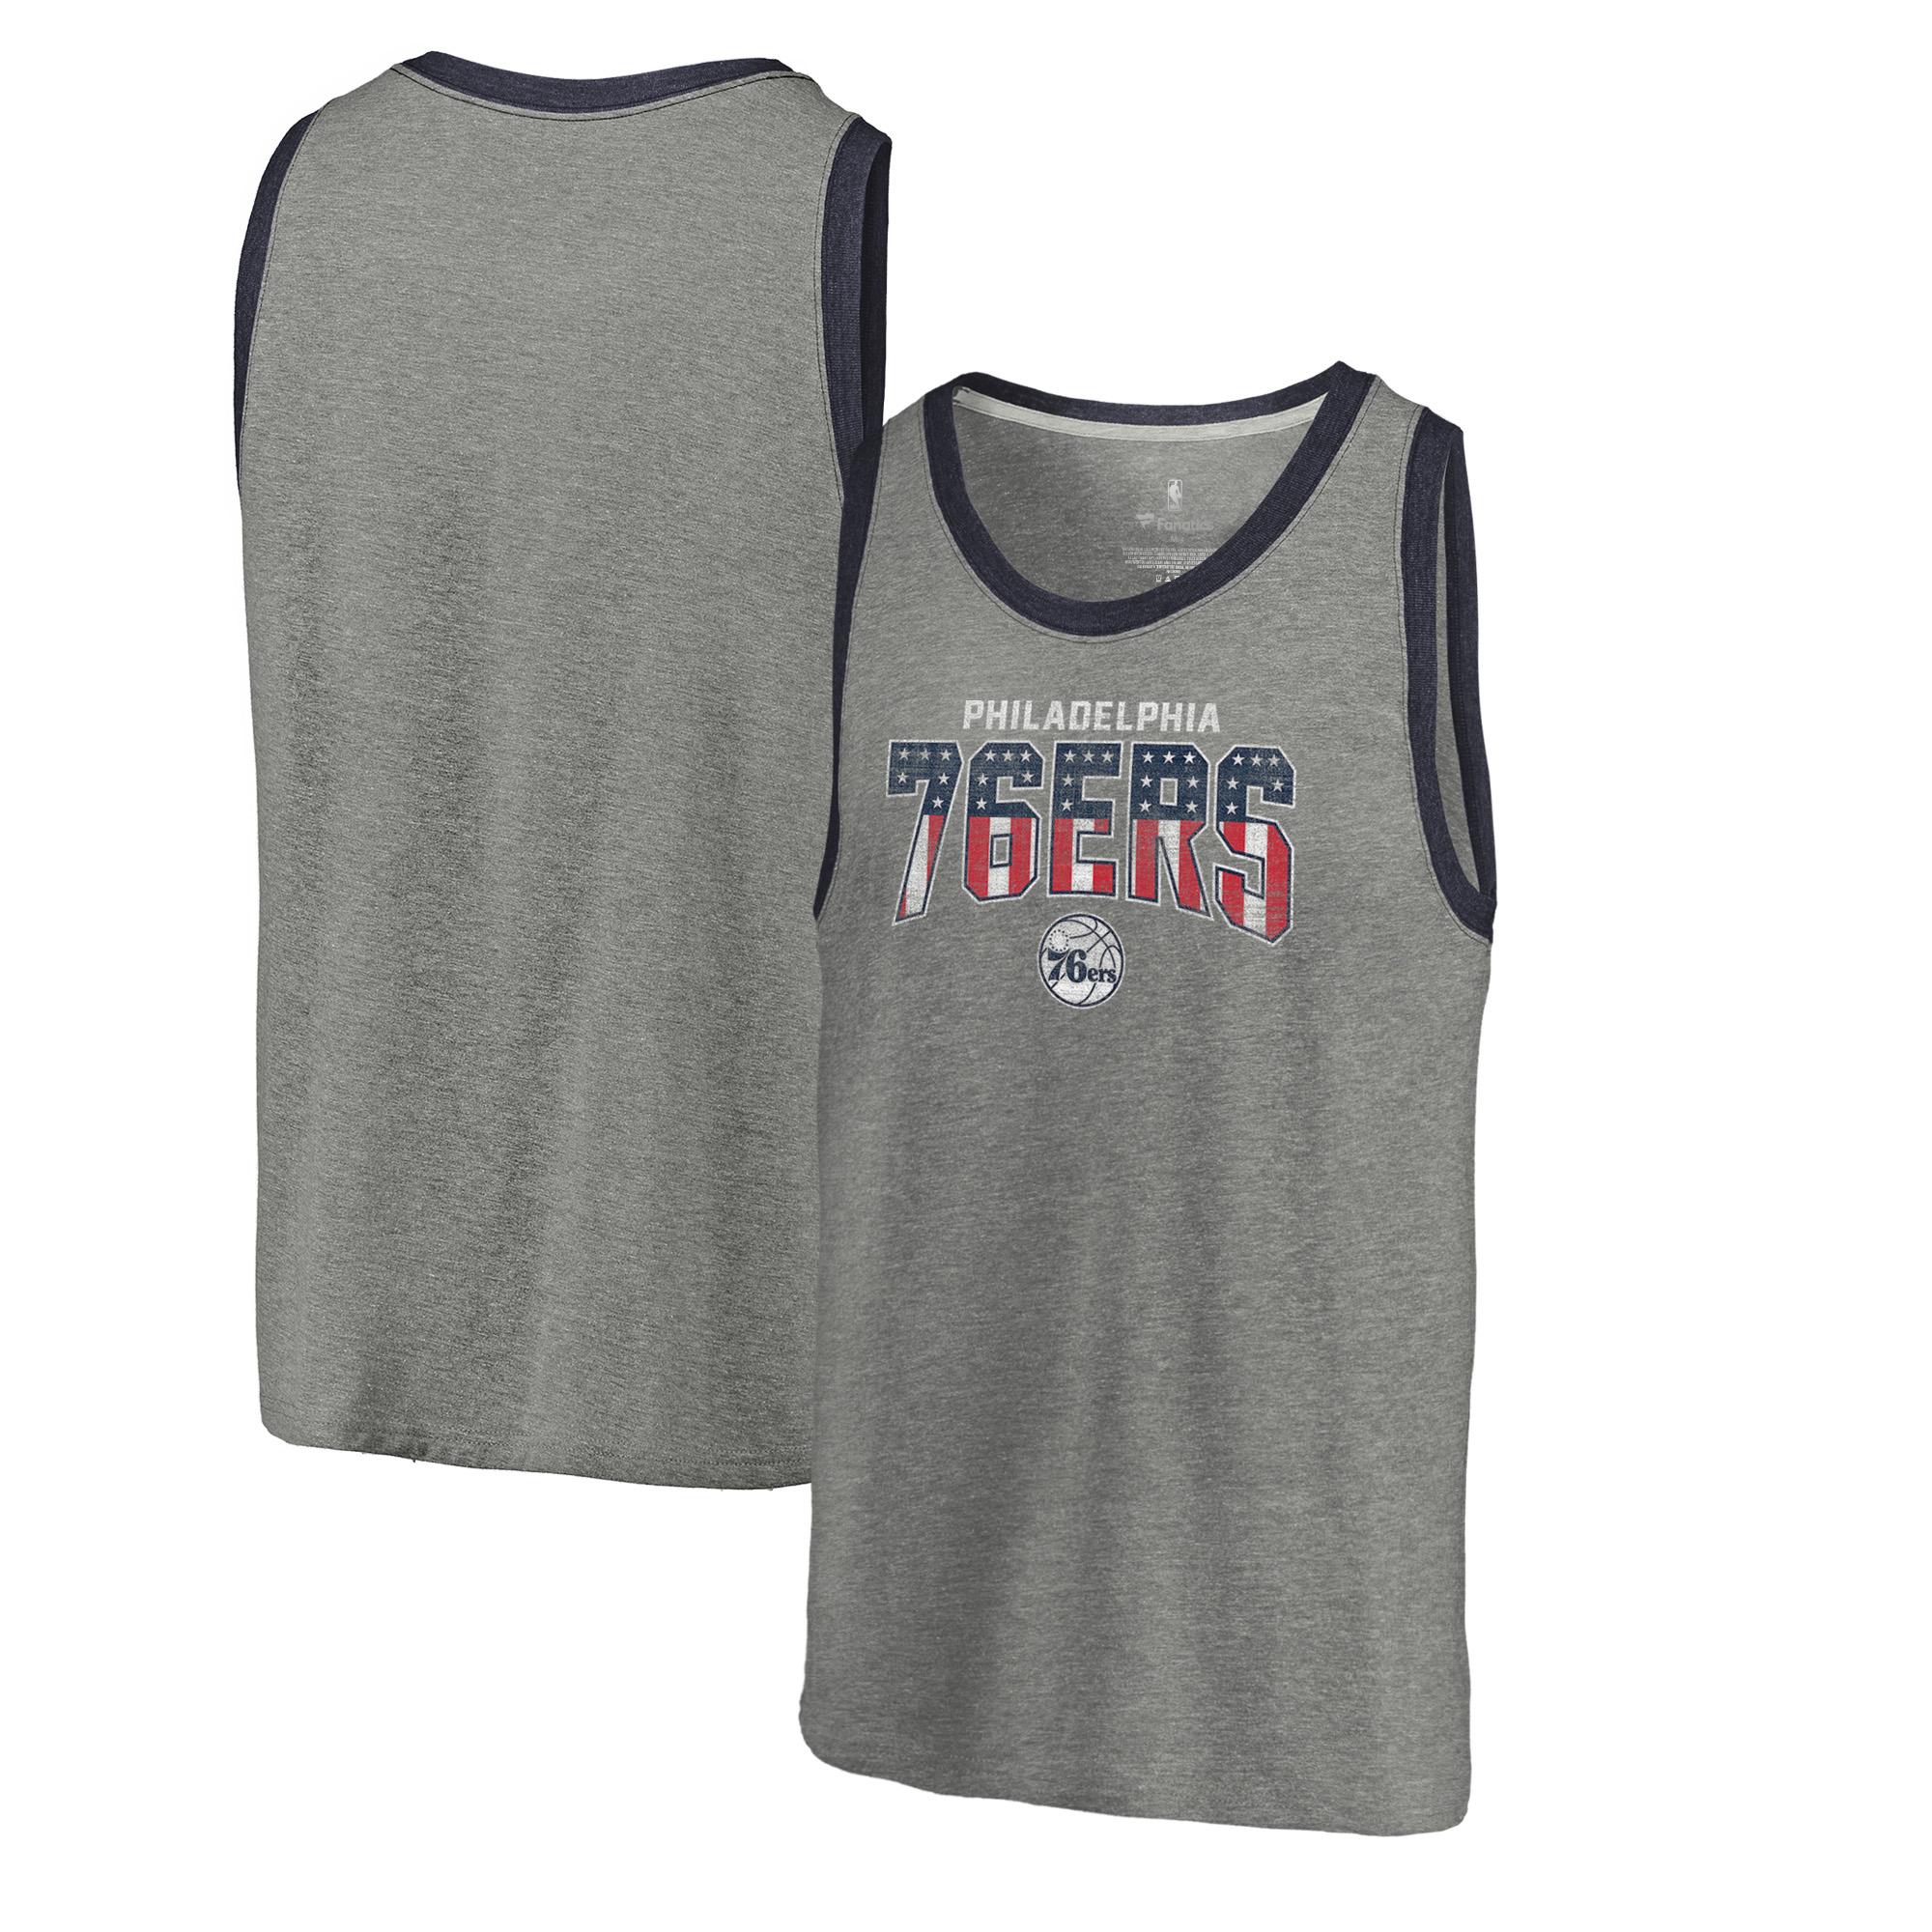 Philadelphia 76ers Fanatics Branded Freedom Tri-Blend Tank Top - Heathered Gray